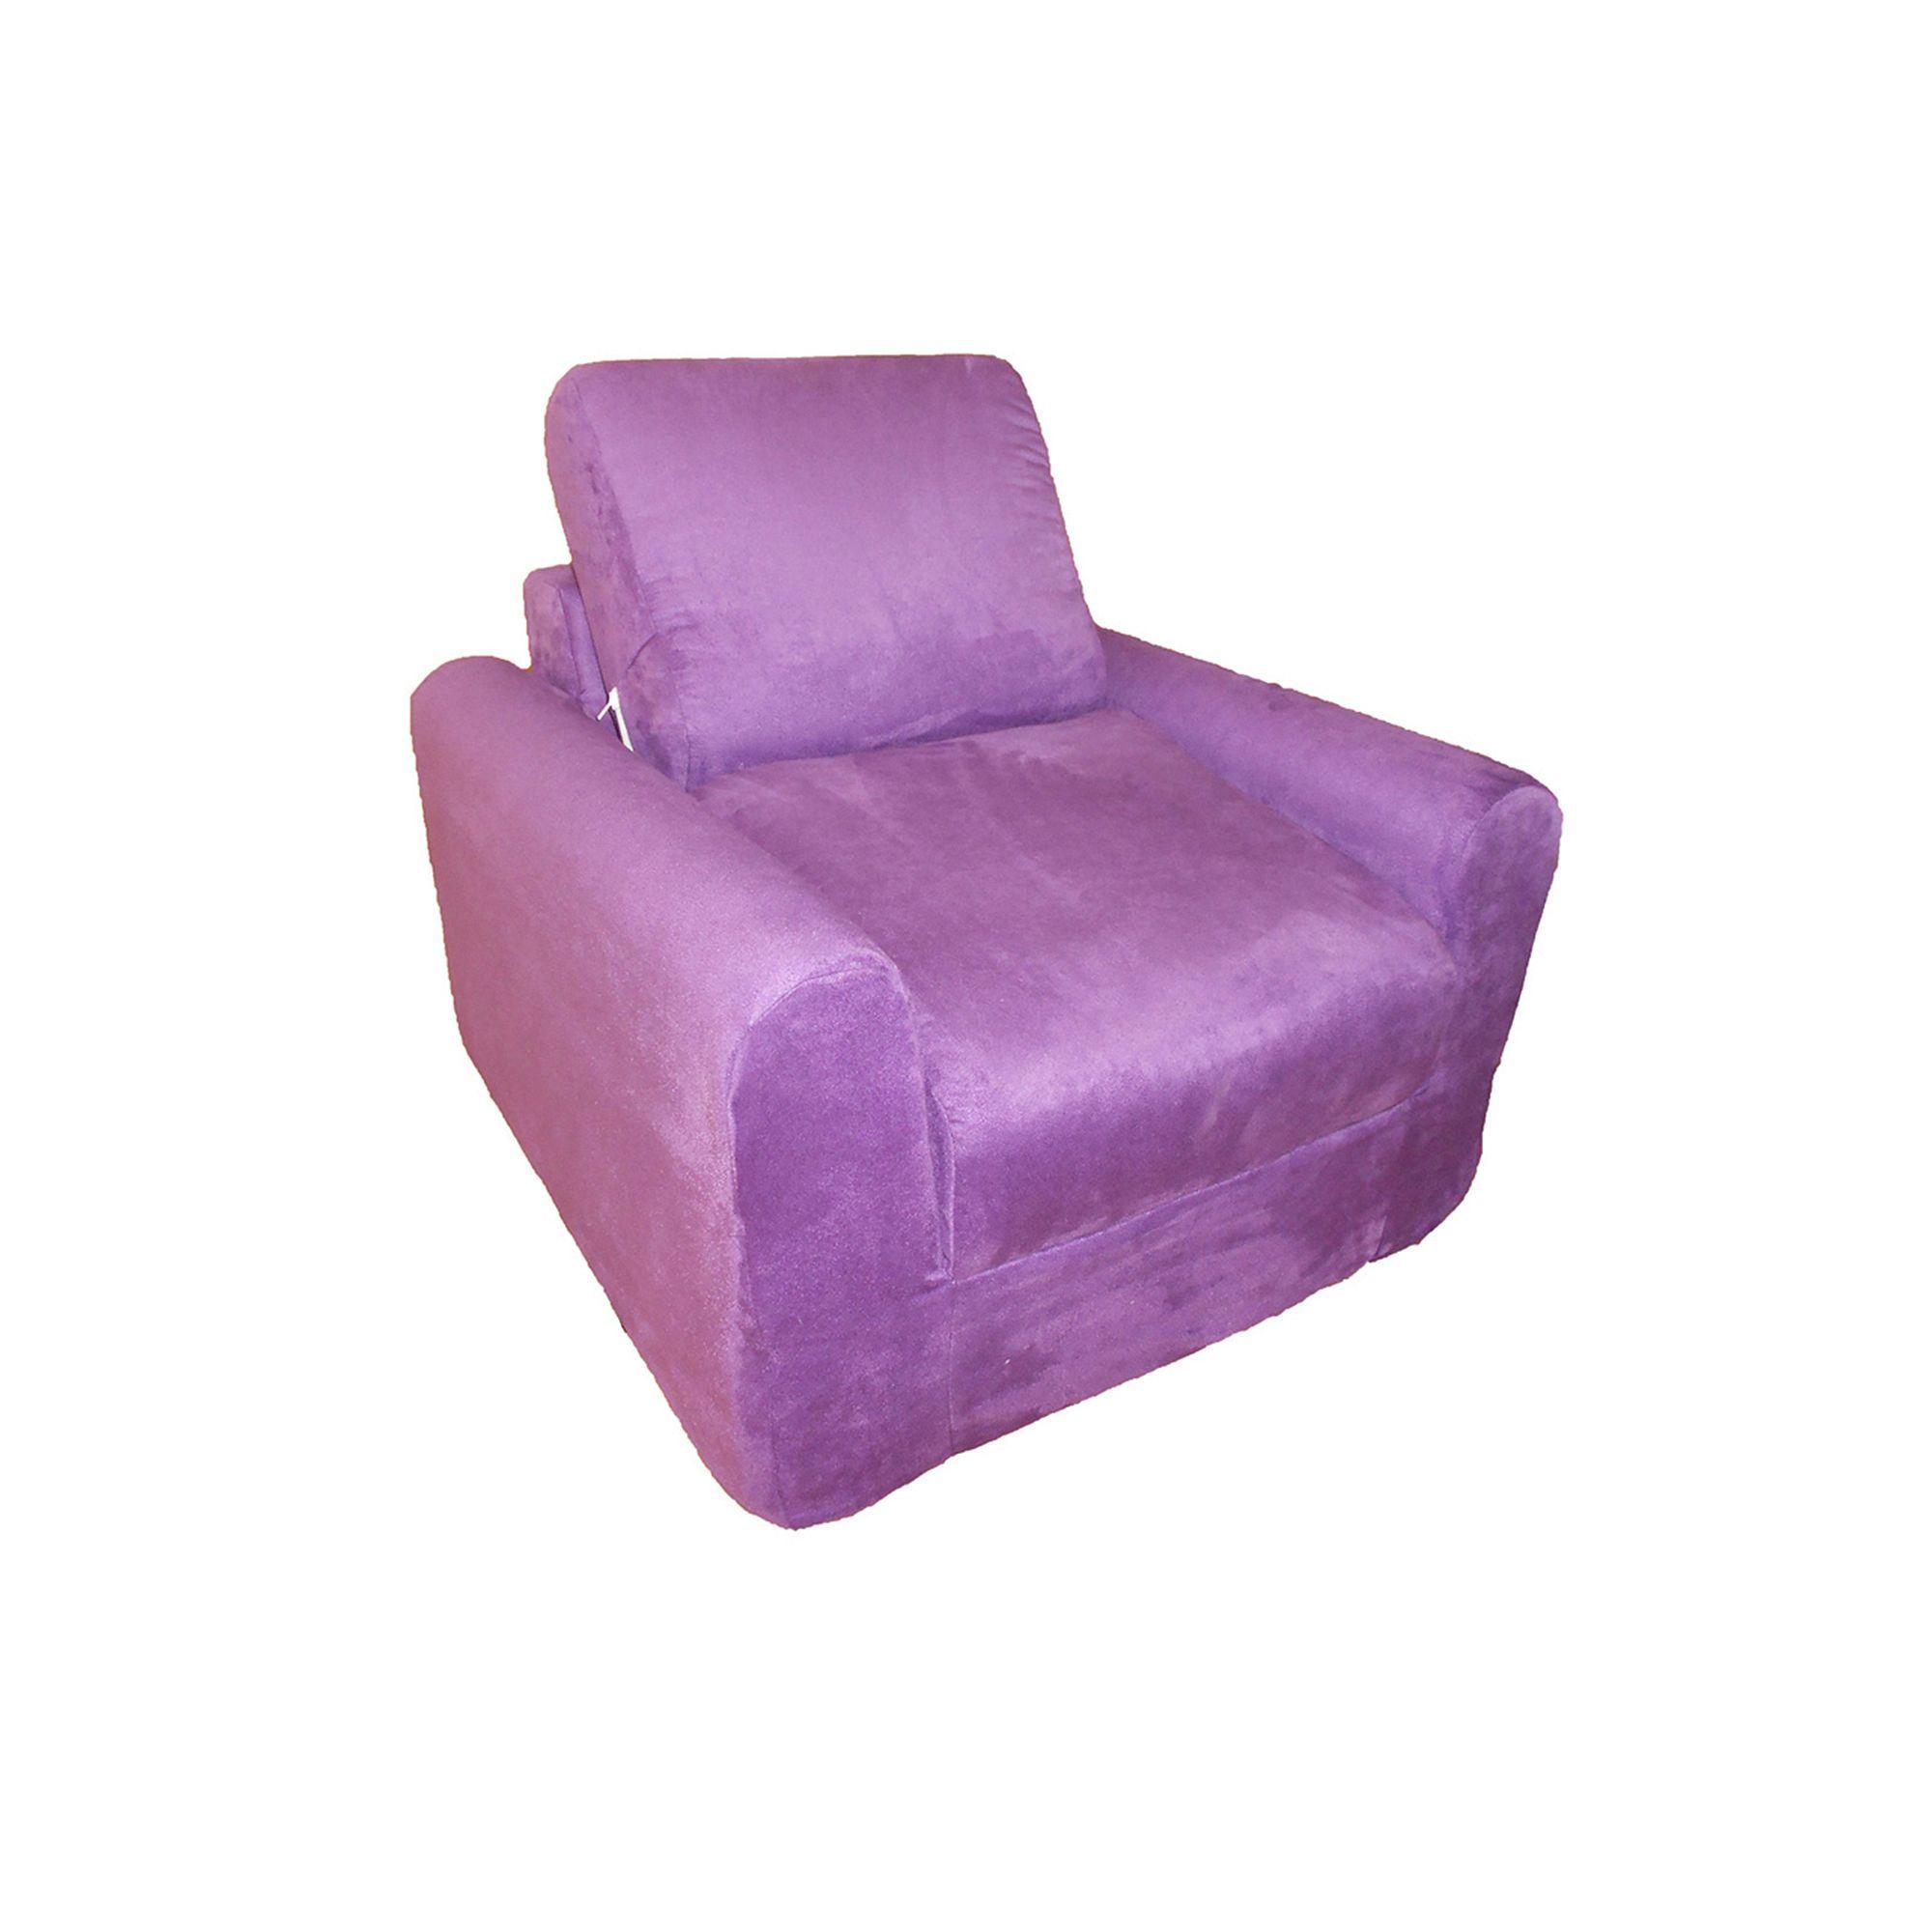 Surprising Fun Furnishings Microsuede Sleeper Chair Kids In 2019 Machost Co Dining Chair Design Ideas Machostcouk